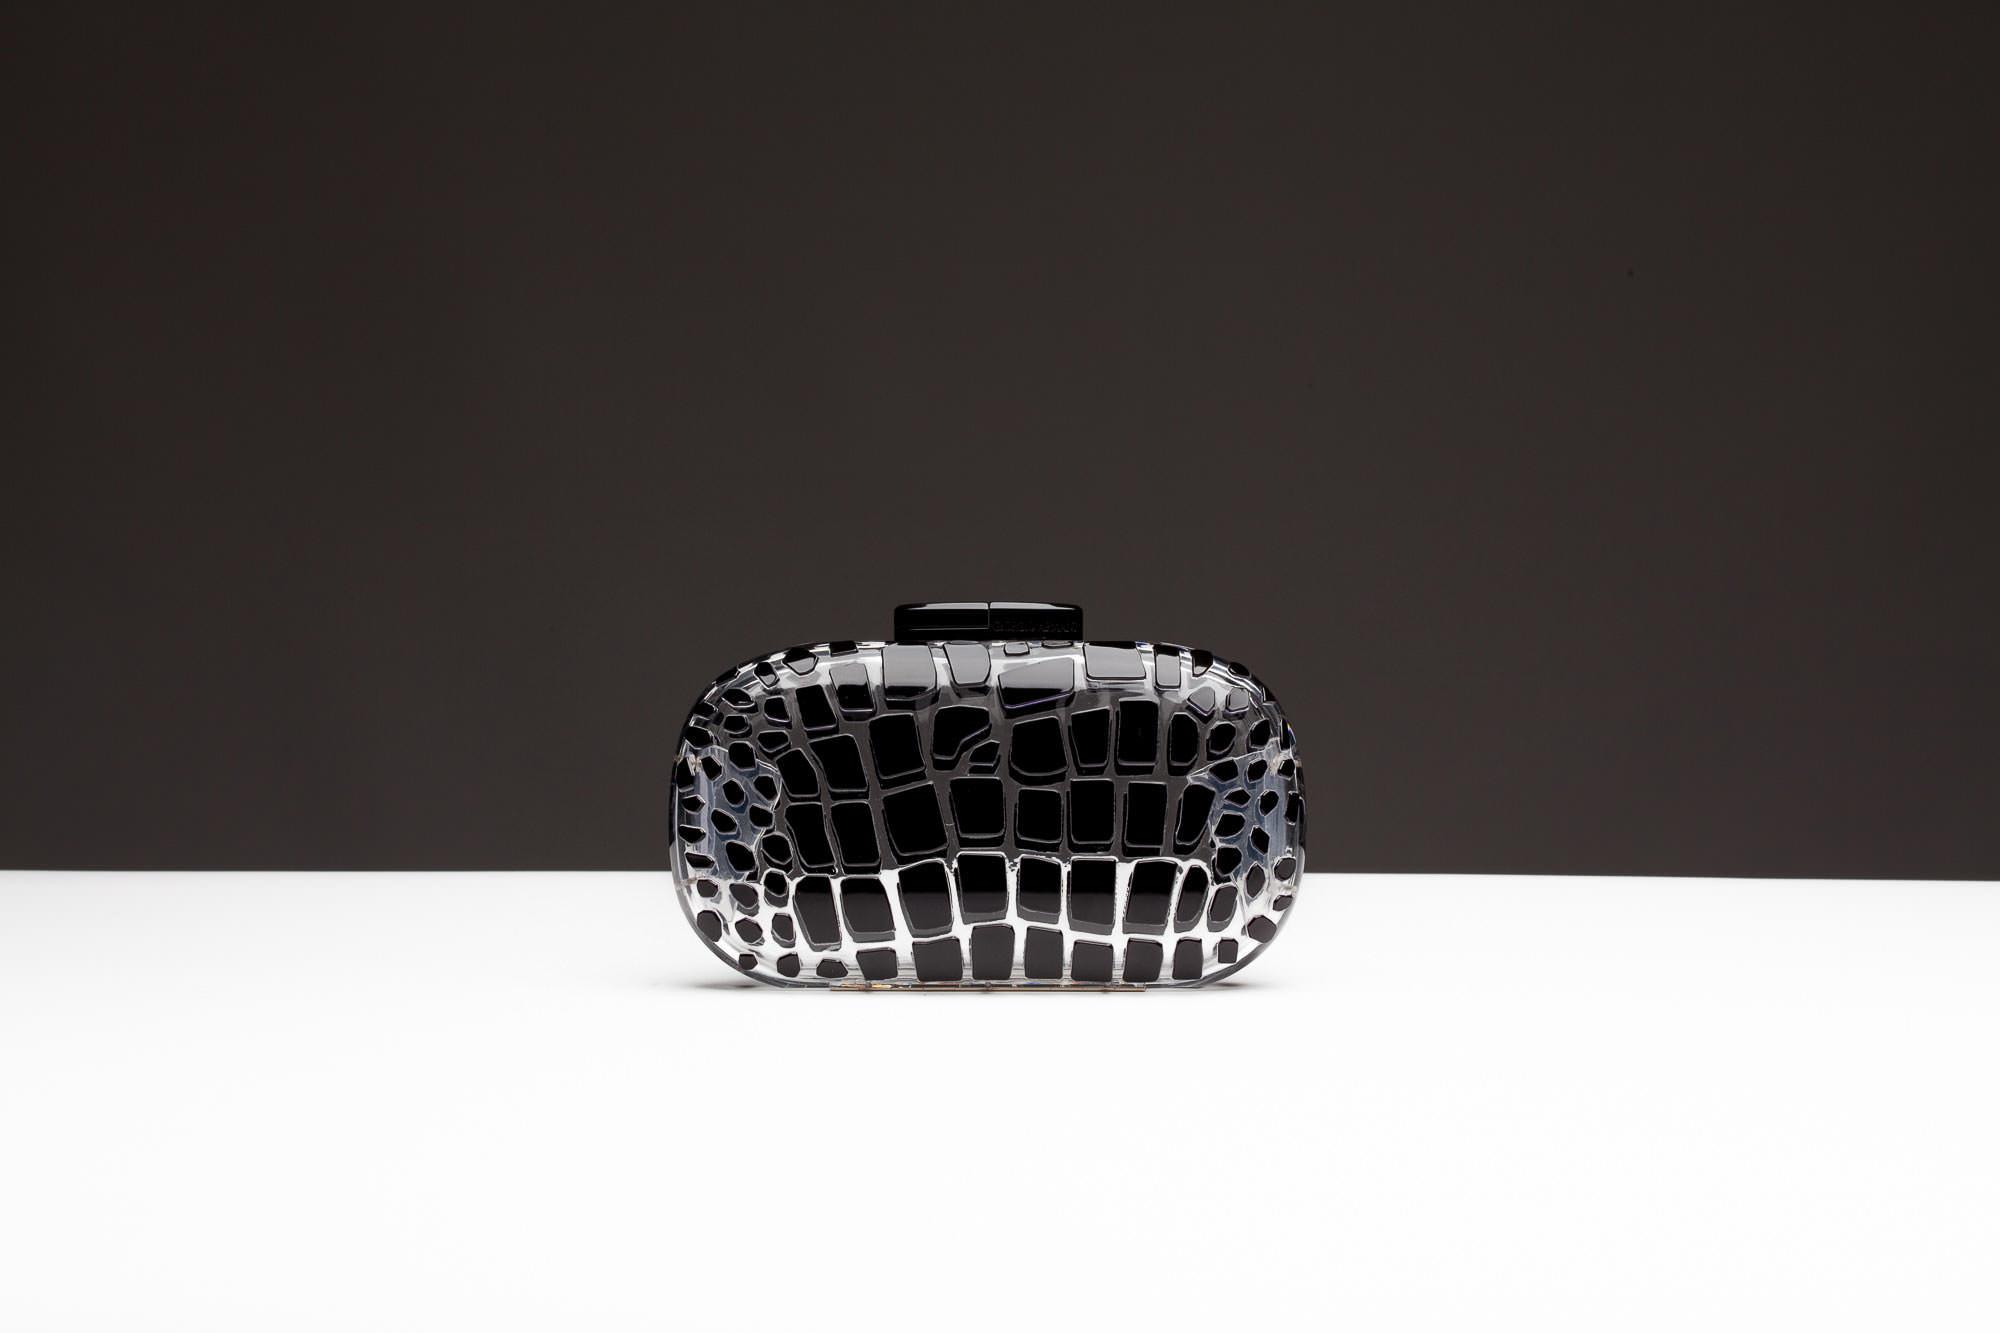 L'objet fétiche : la Minaudière Giorgio Armani